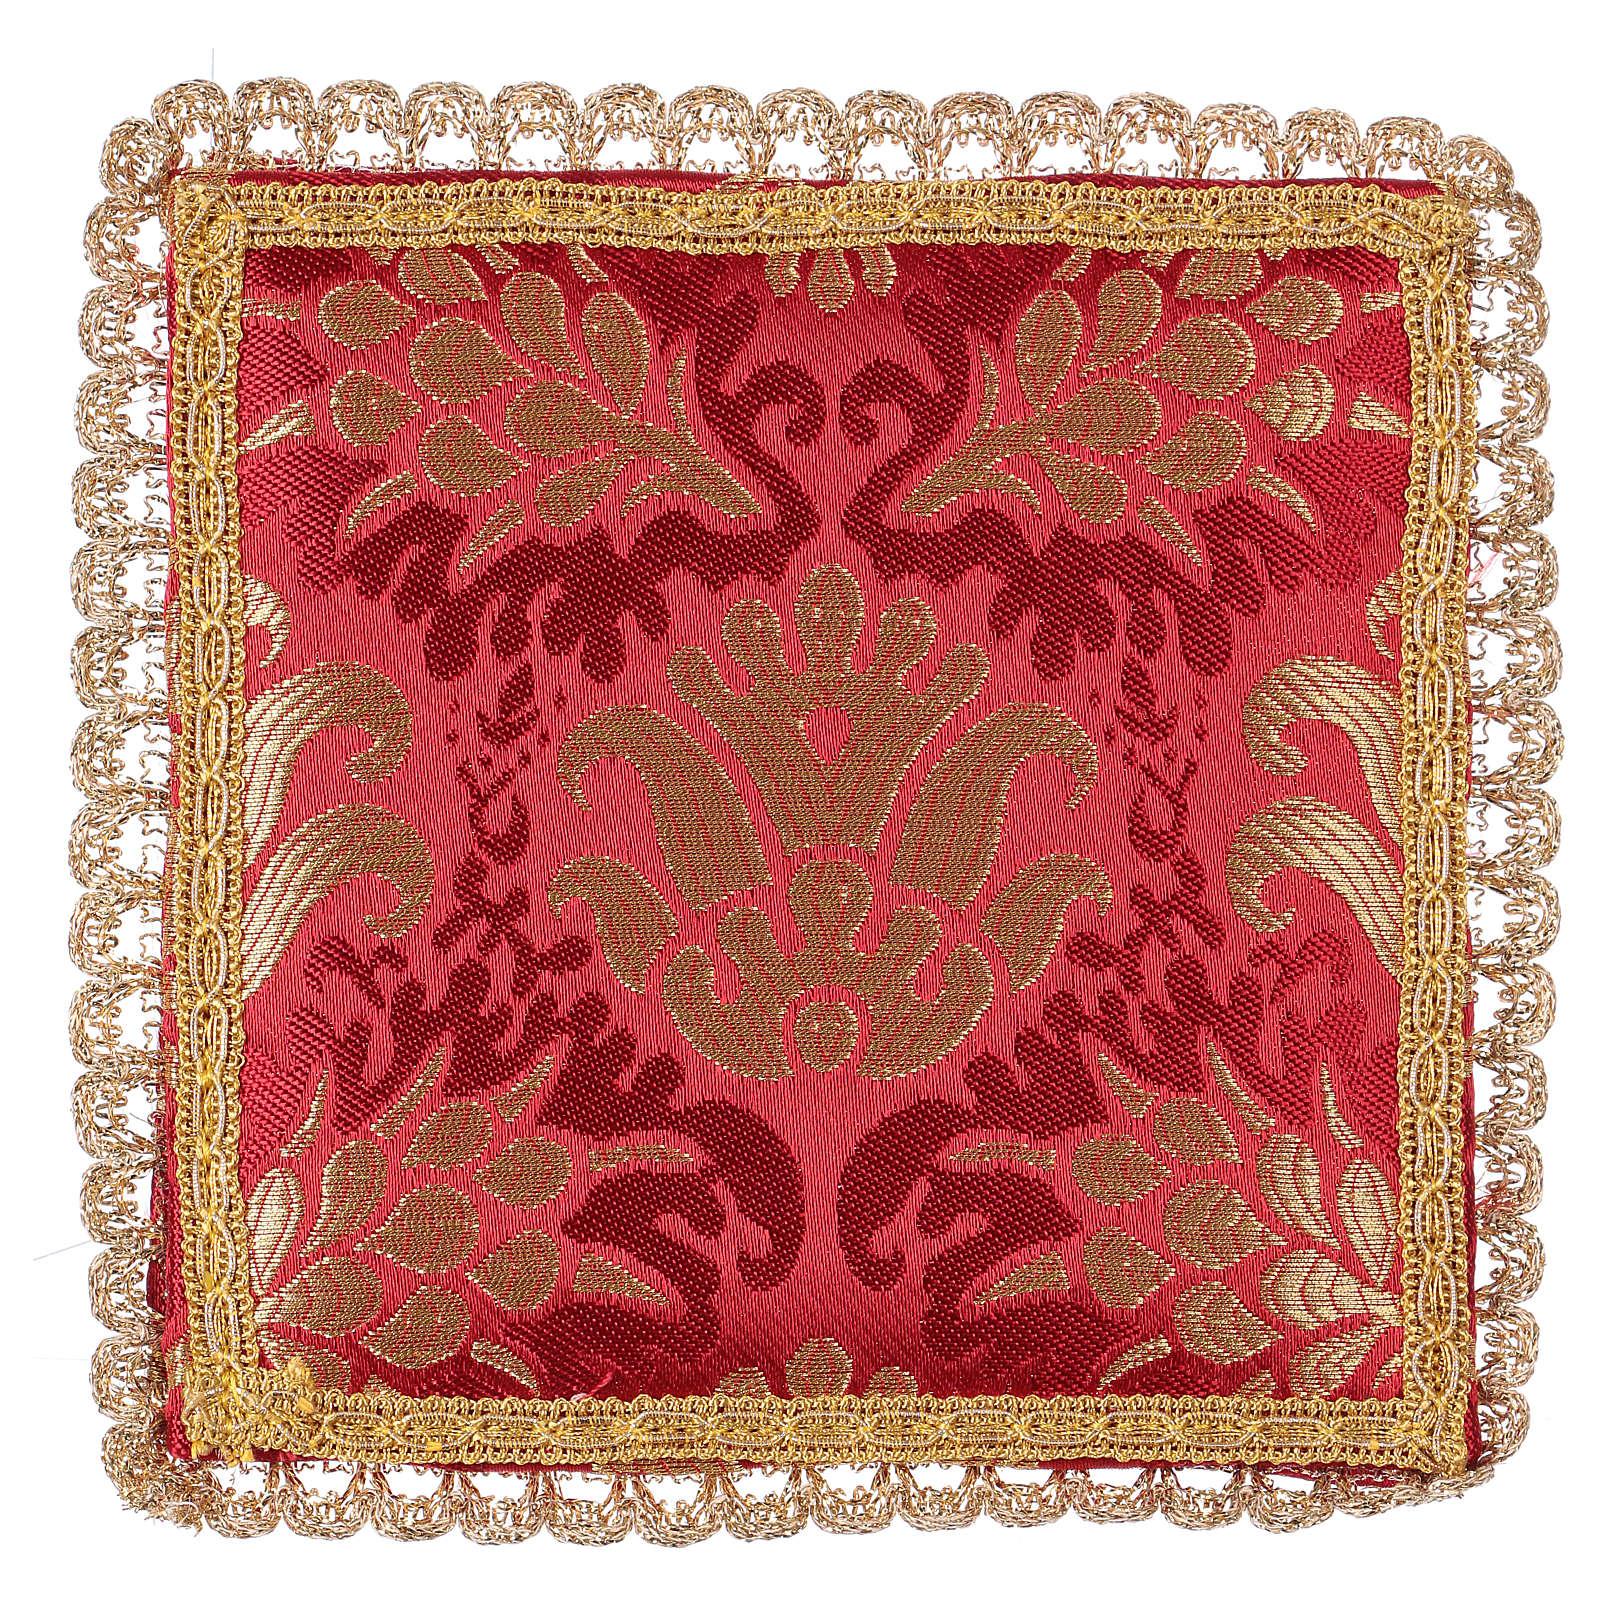 Palia cubre cáliz espigas tejido brocado rojo 4